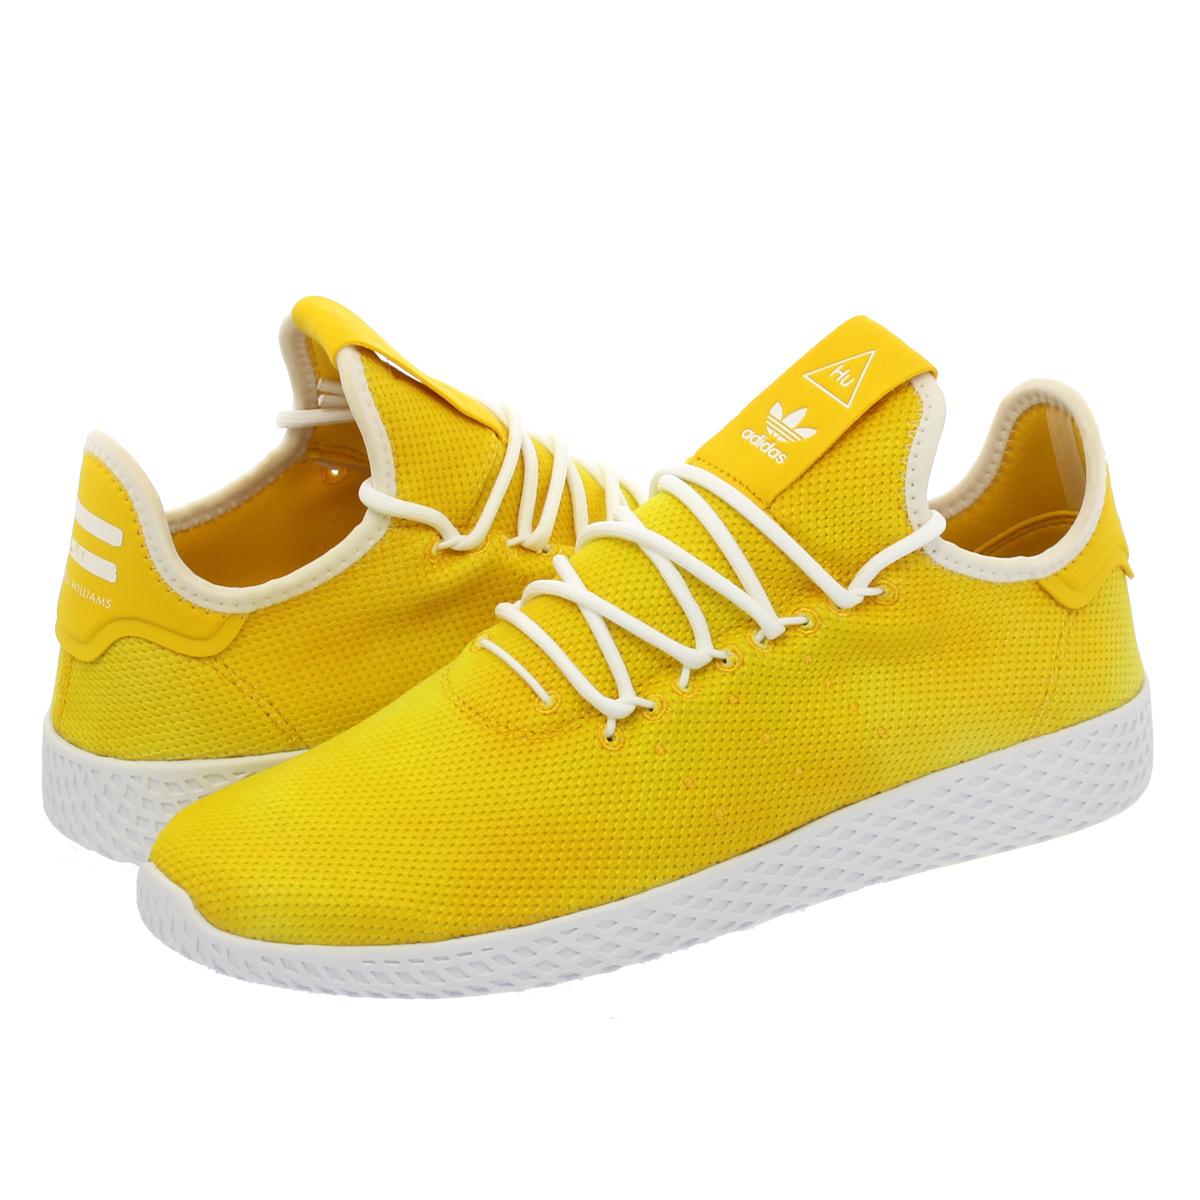 adidas PW HU HOLI TENNIS HU Adidas Farrell Williams tennis HU YELLOW WHITE 9df13fb88fd